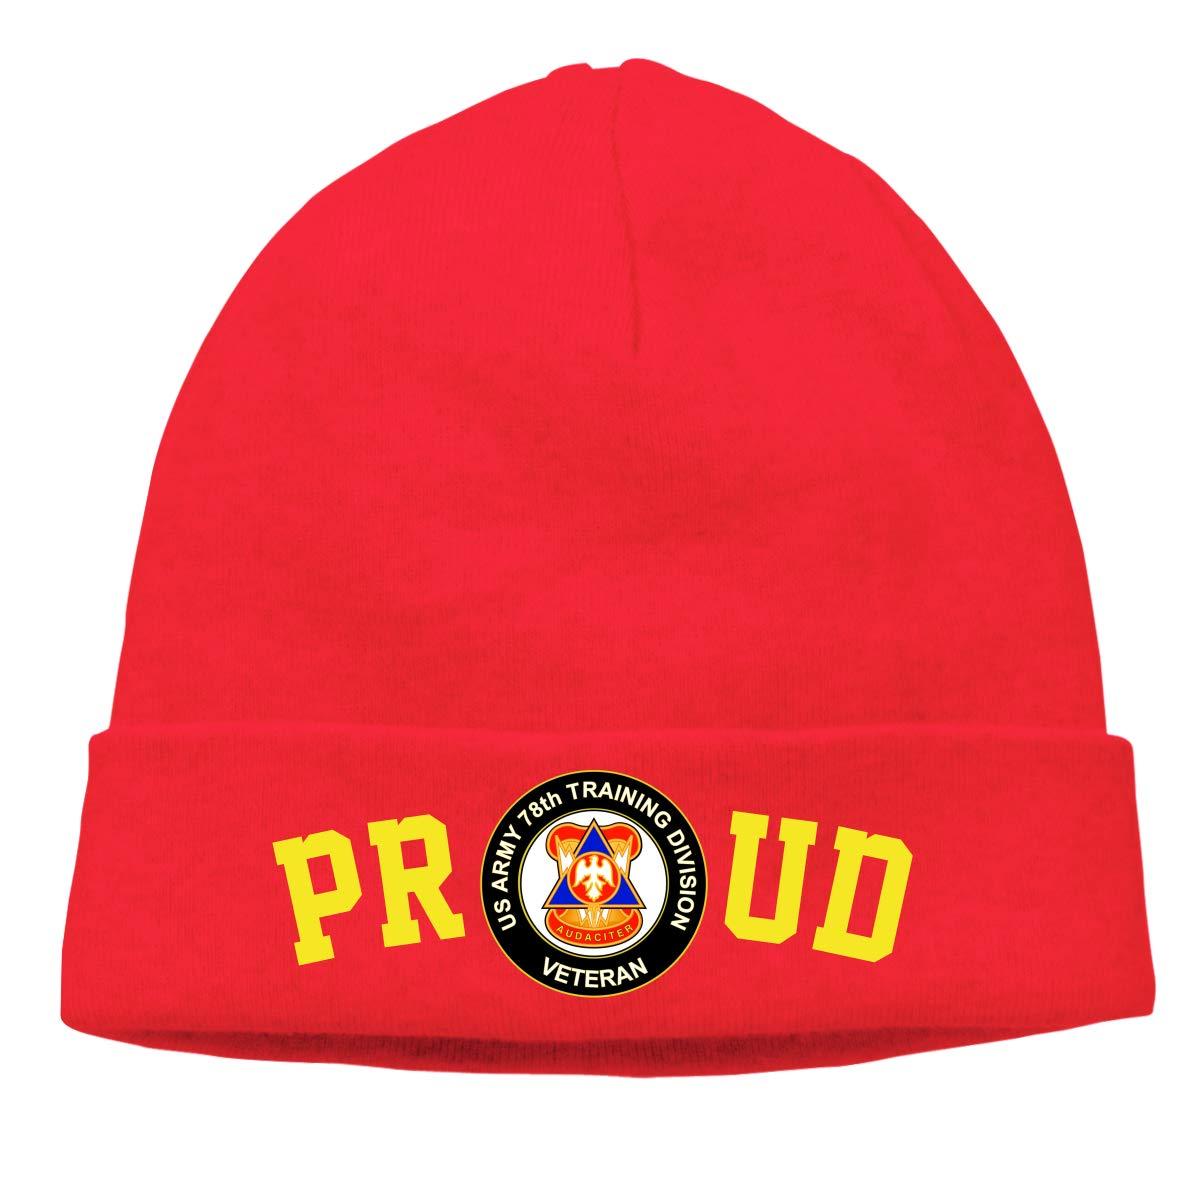 FORDSAN CP Proud US Army 78th Training Division Veteran Mens Beanie Cap Skull Cap Winter Warm Knitting Hats.